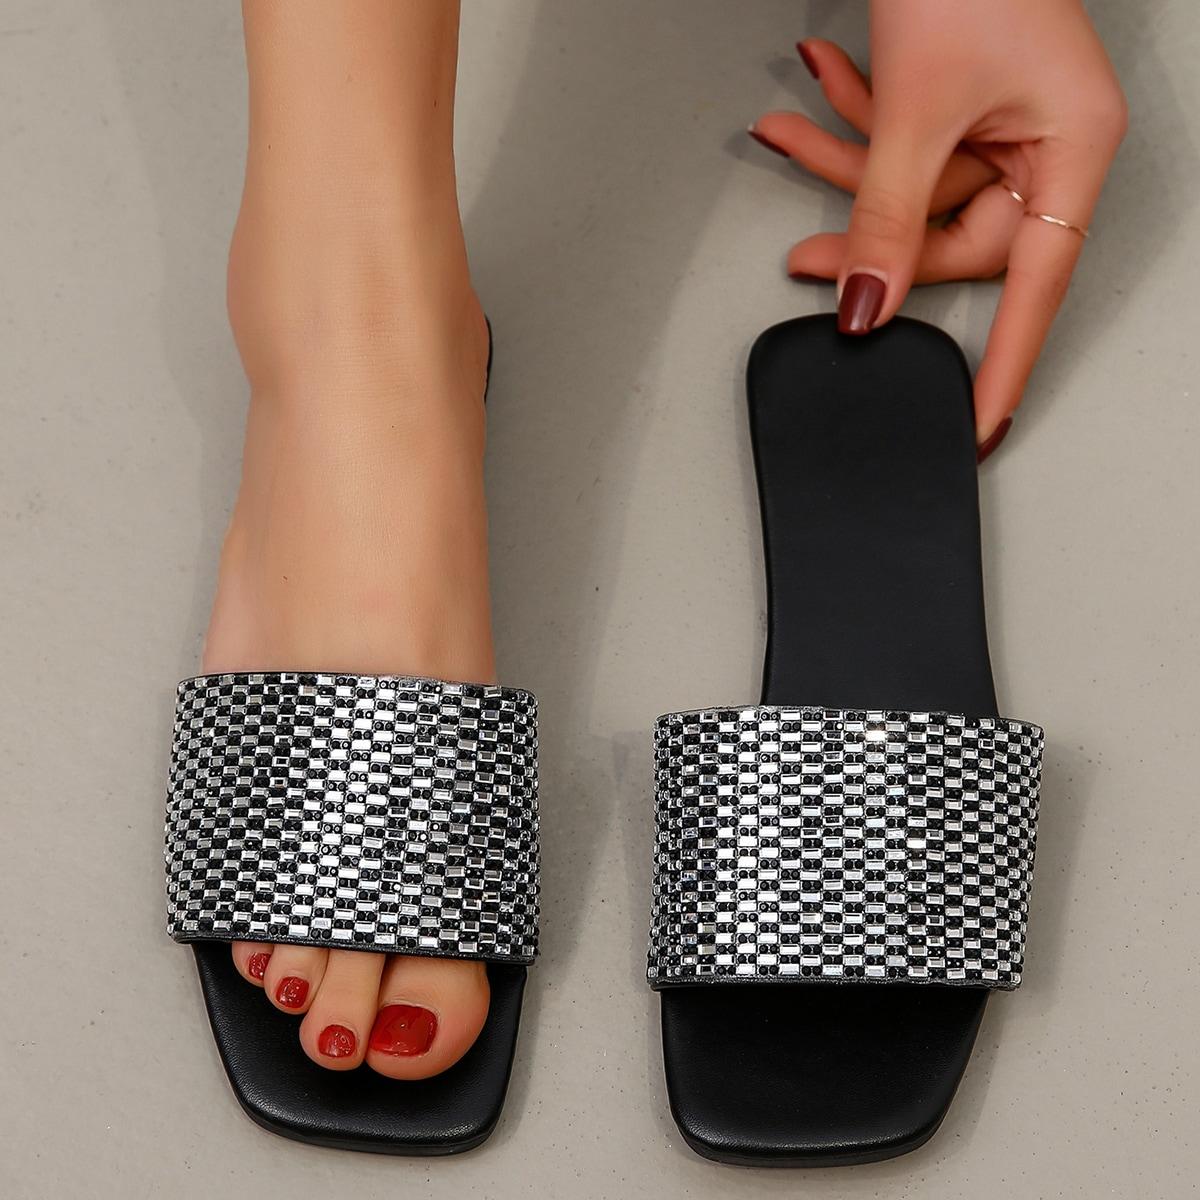 SHEIN Glijbaan sandalen met metallic strass decor